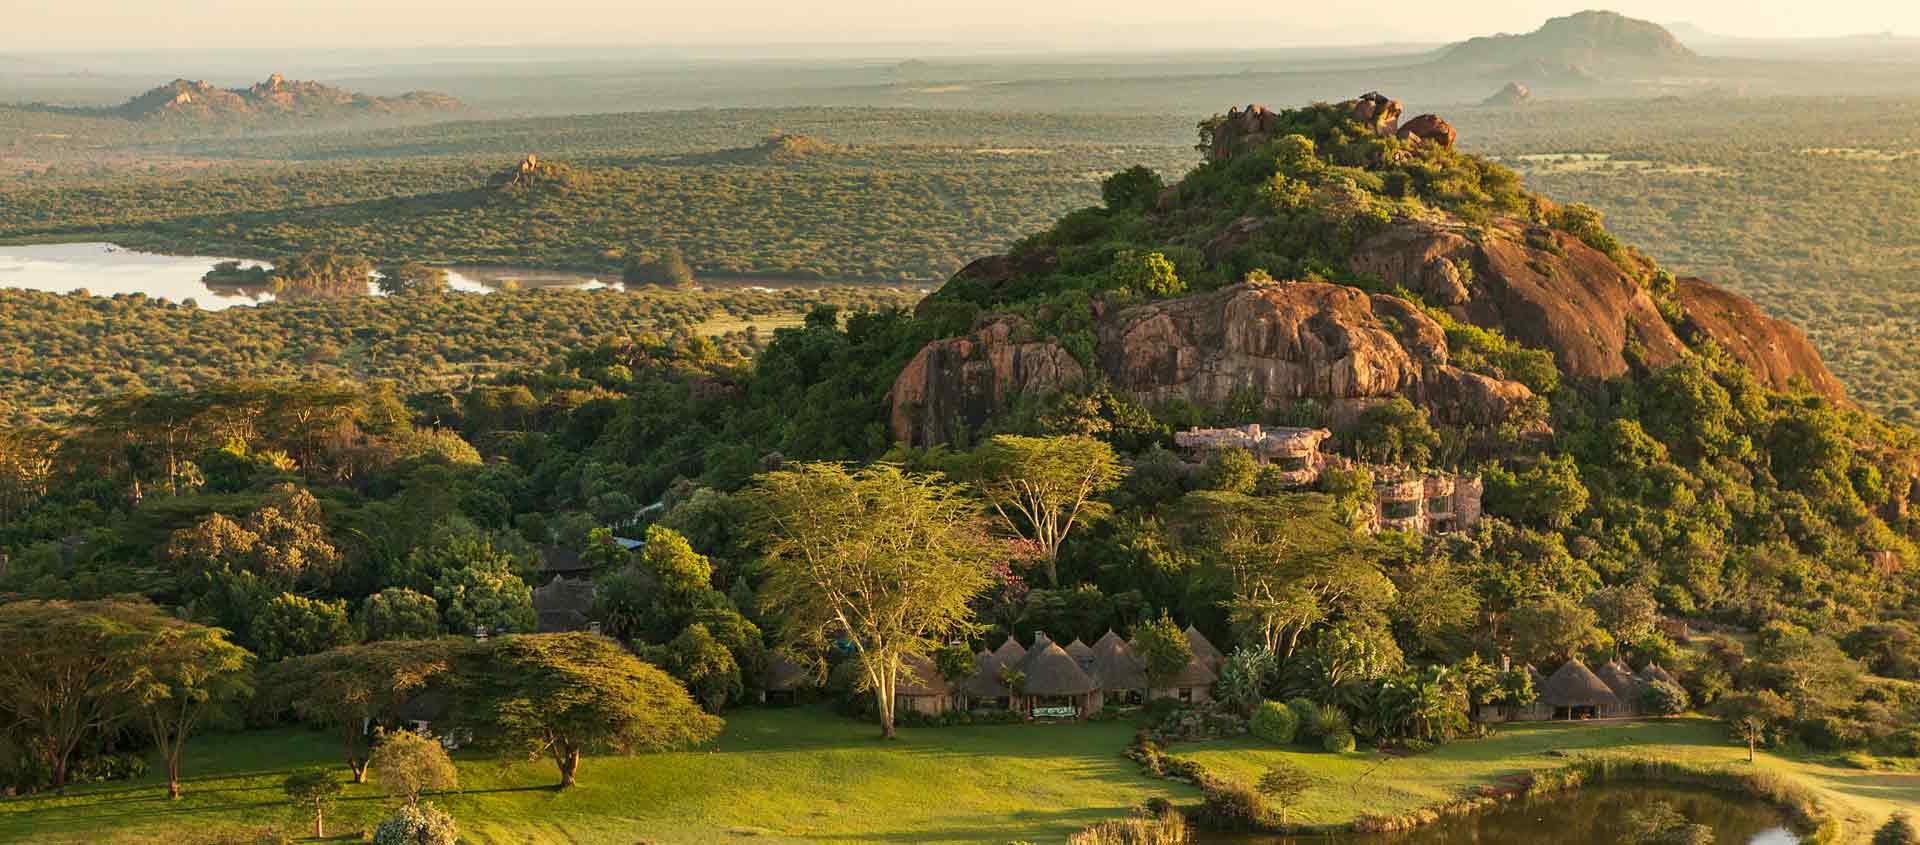 Kenya Private Wildlife Reserves aerial view of Ol Jogi